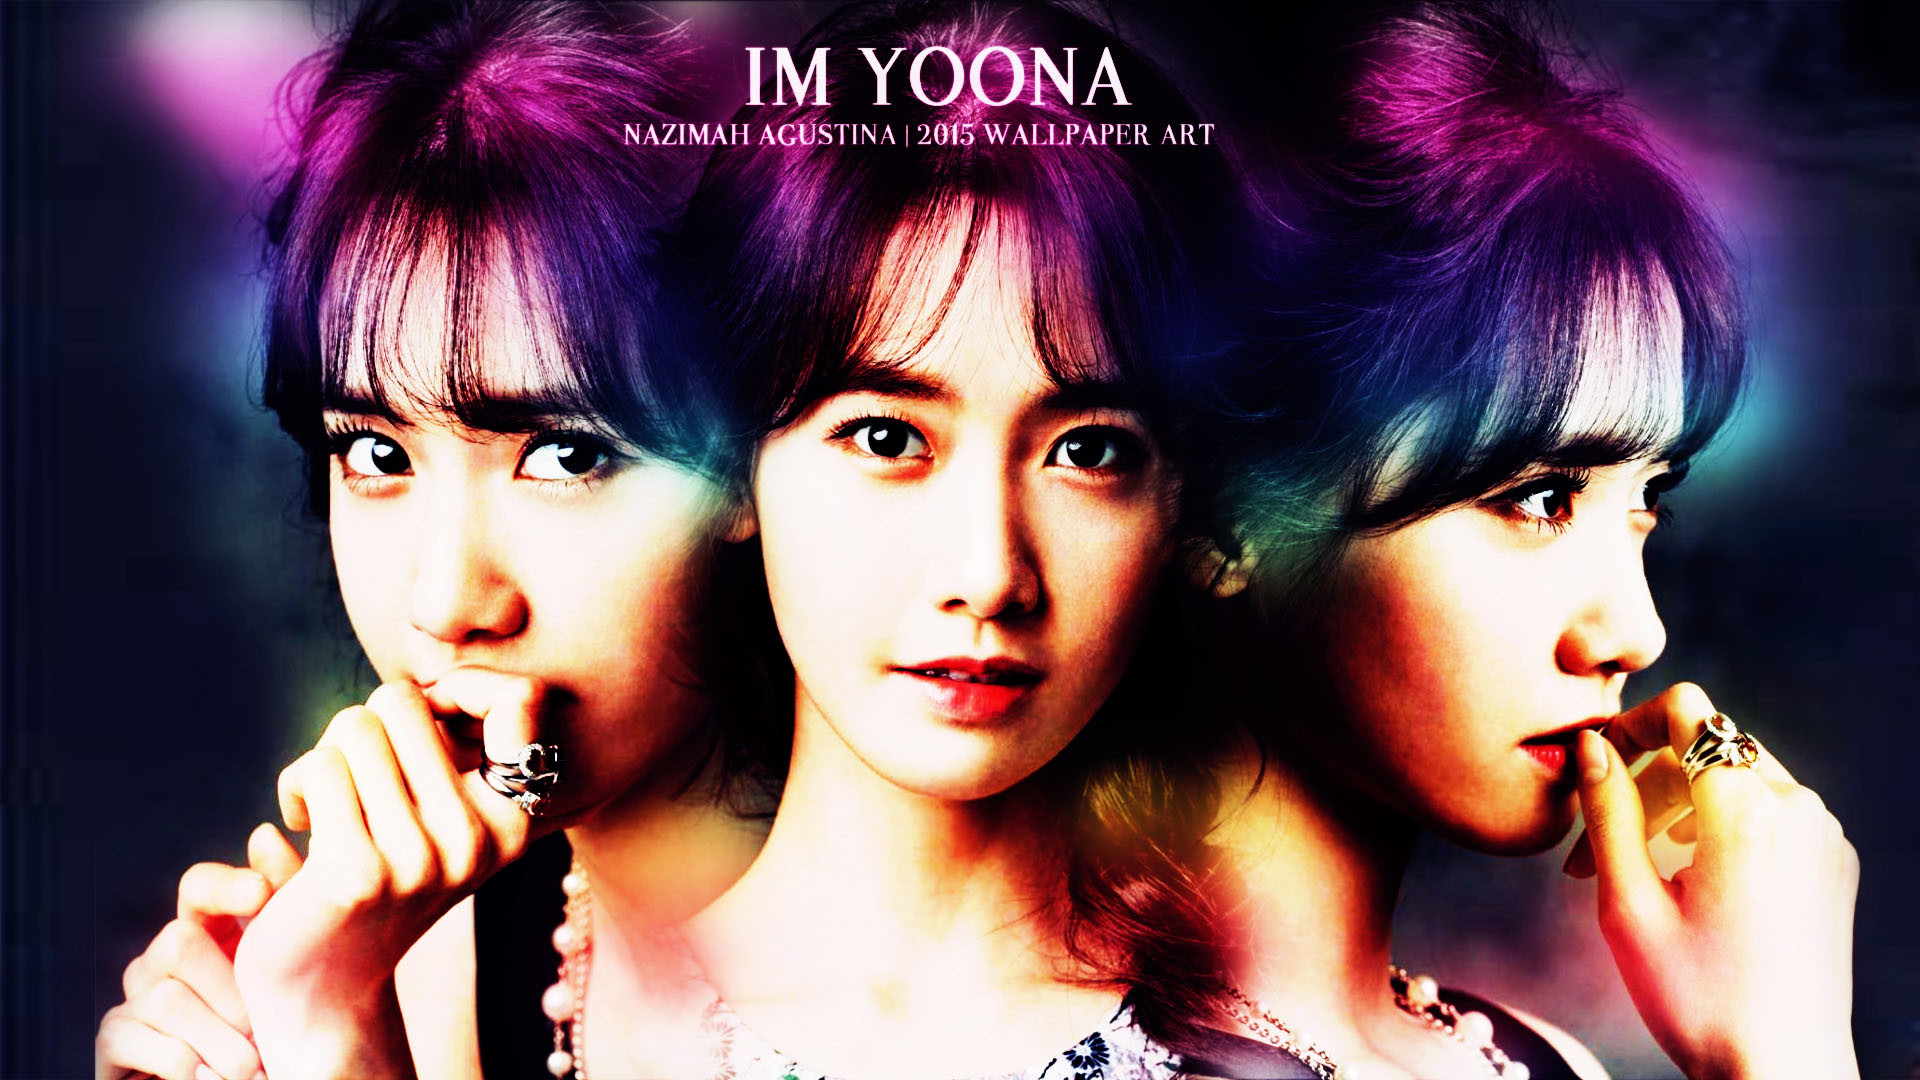 Im Yoona Movie List Beautiful yoona wallpaper 2018 (61+ images)